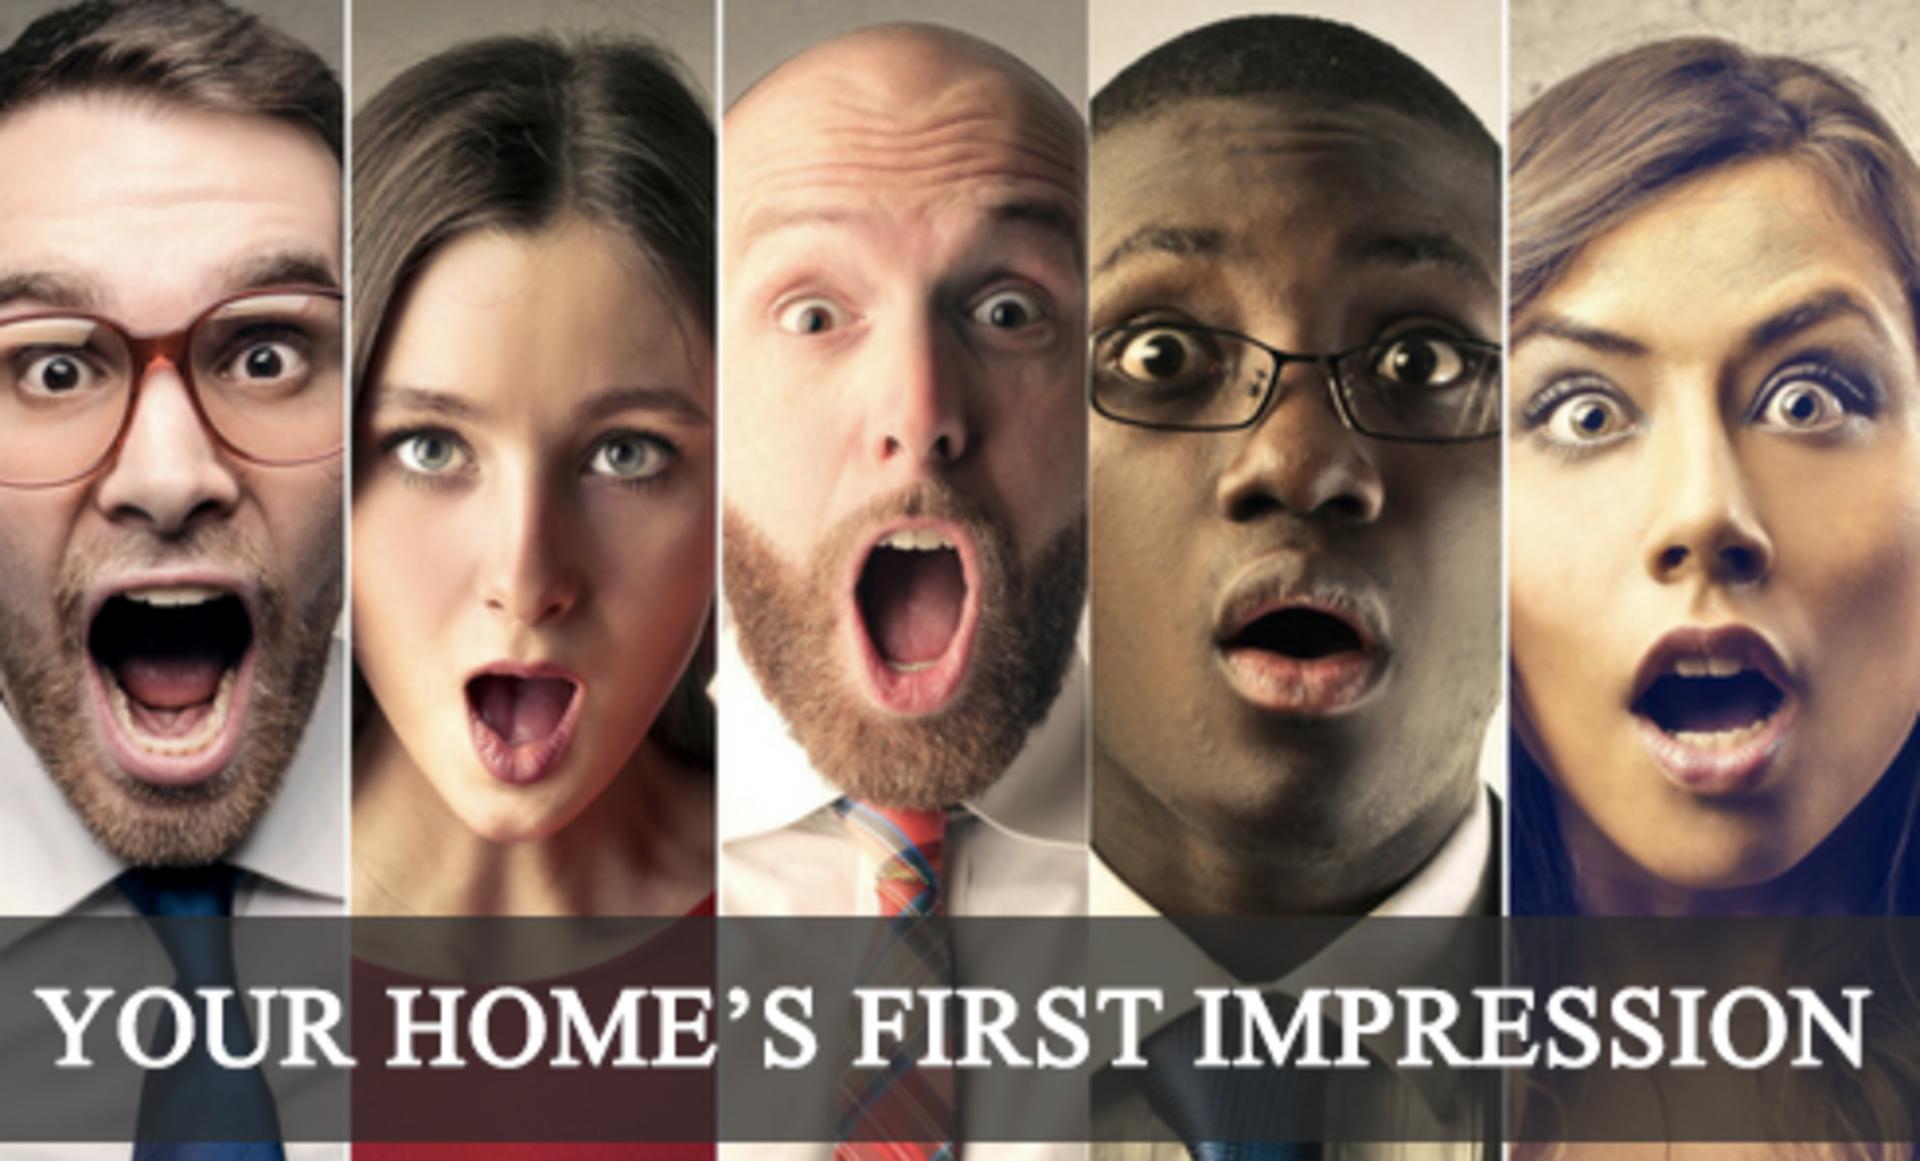 Make An Amazing First Impression